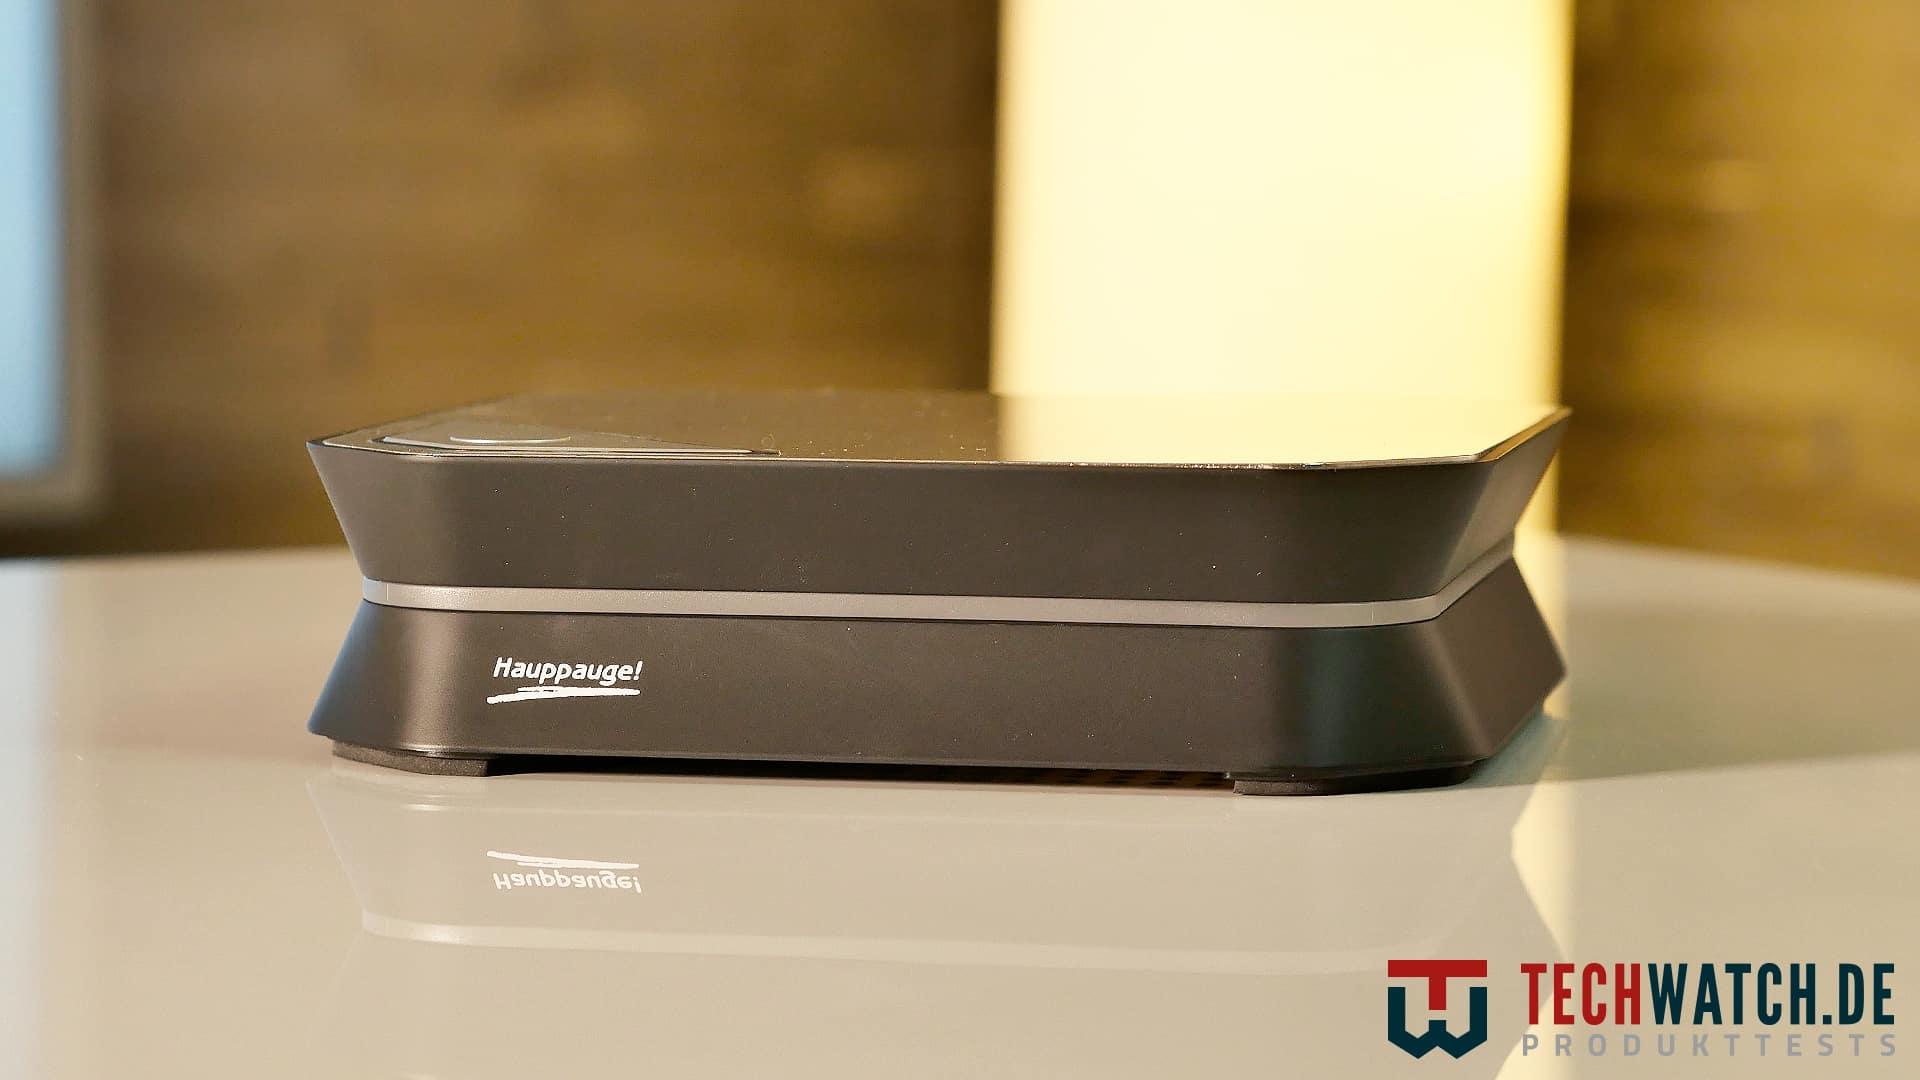 Hauppauge HD PVR60 Front